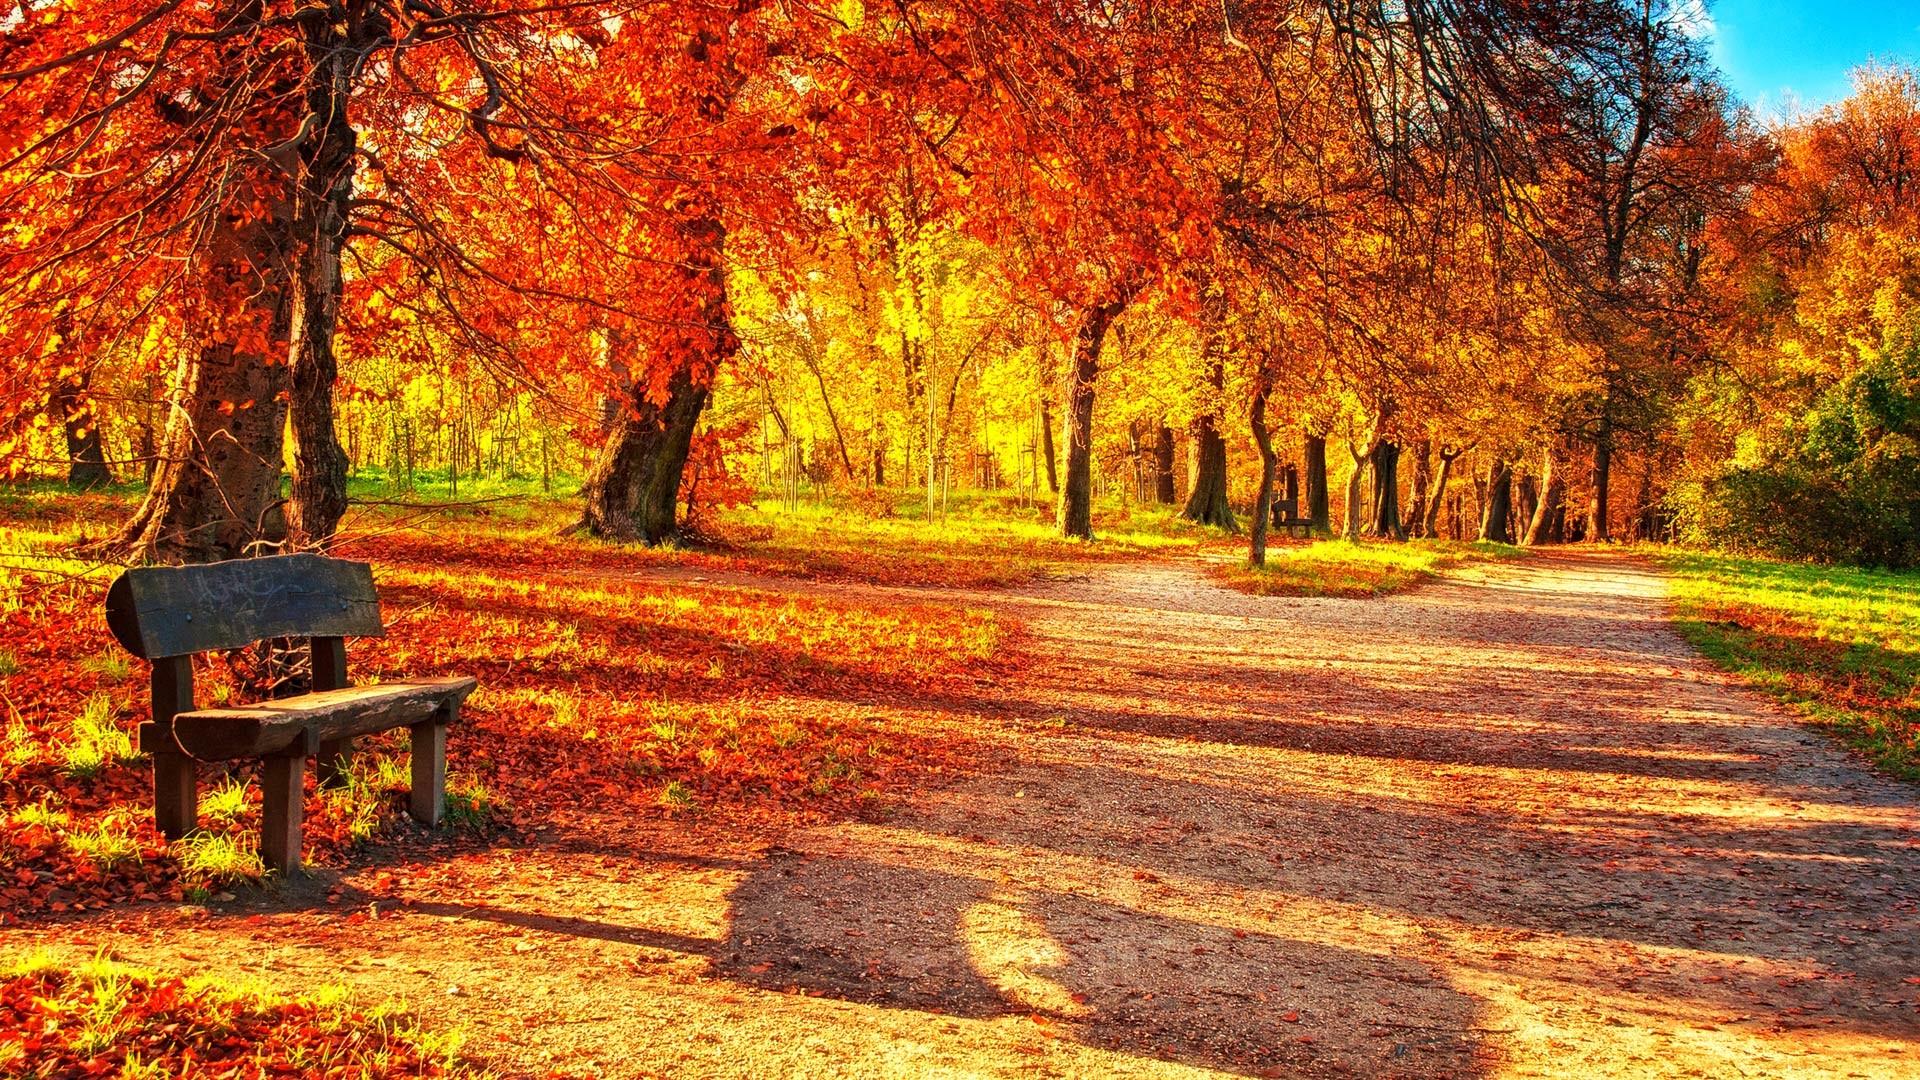 Download Autumn Leaves Wallpaper Desktop #x0ray » hdxwallpaperz.com